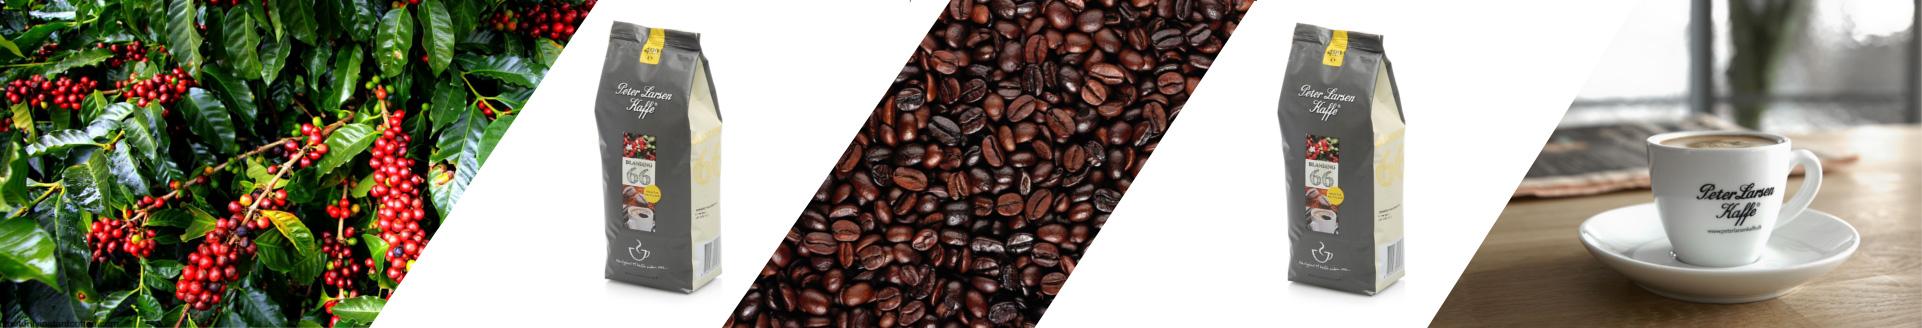 Peter-Larsen-Kaffe